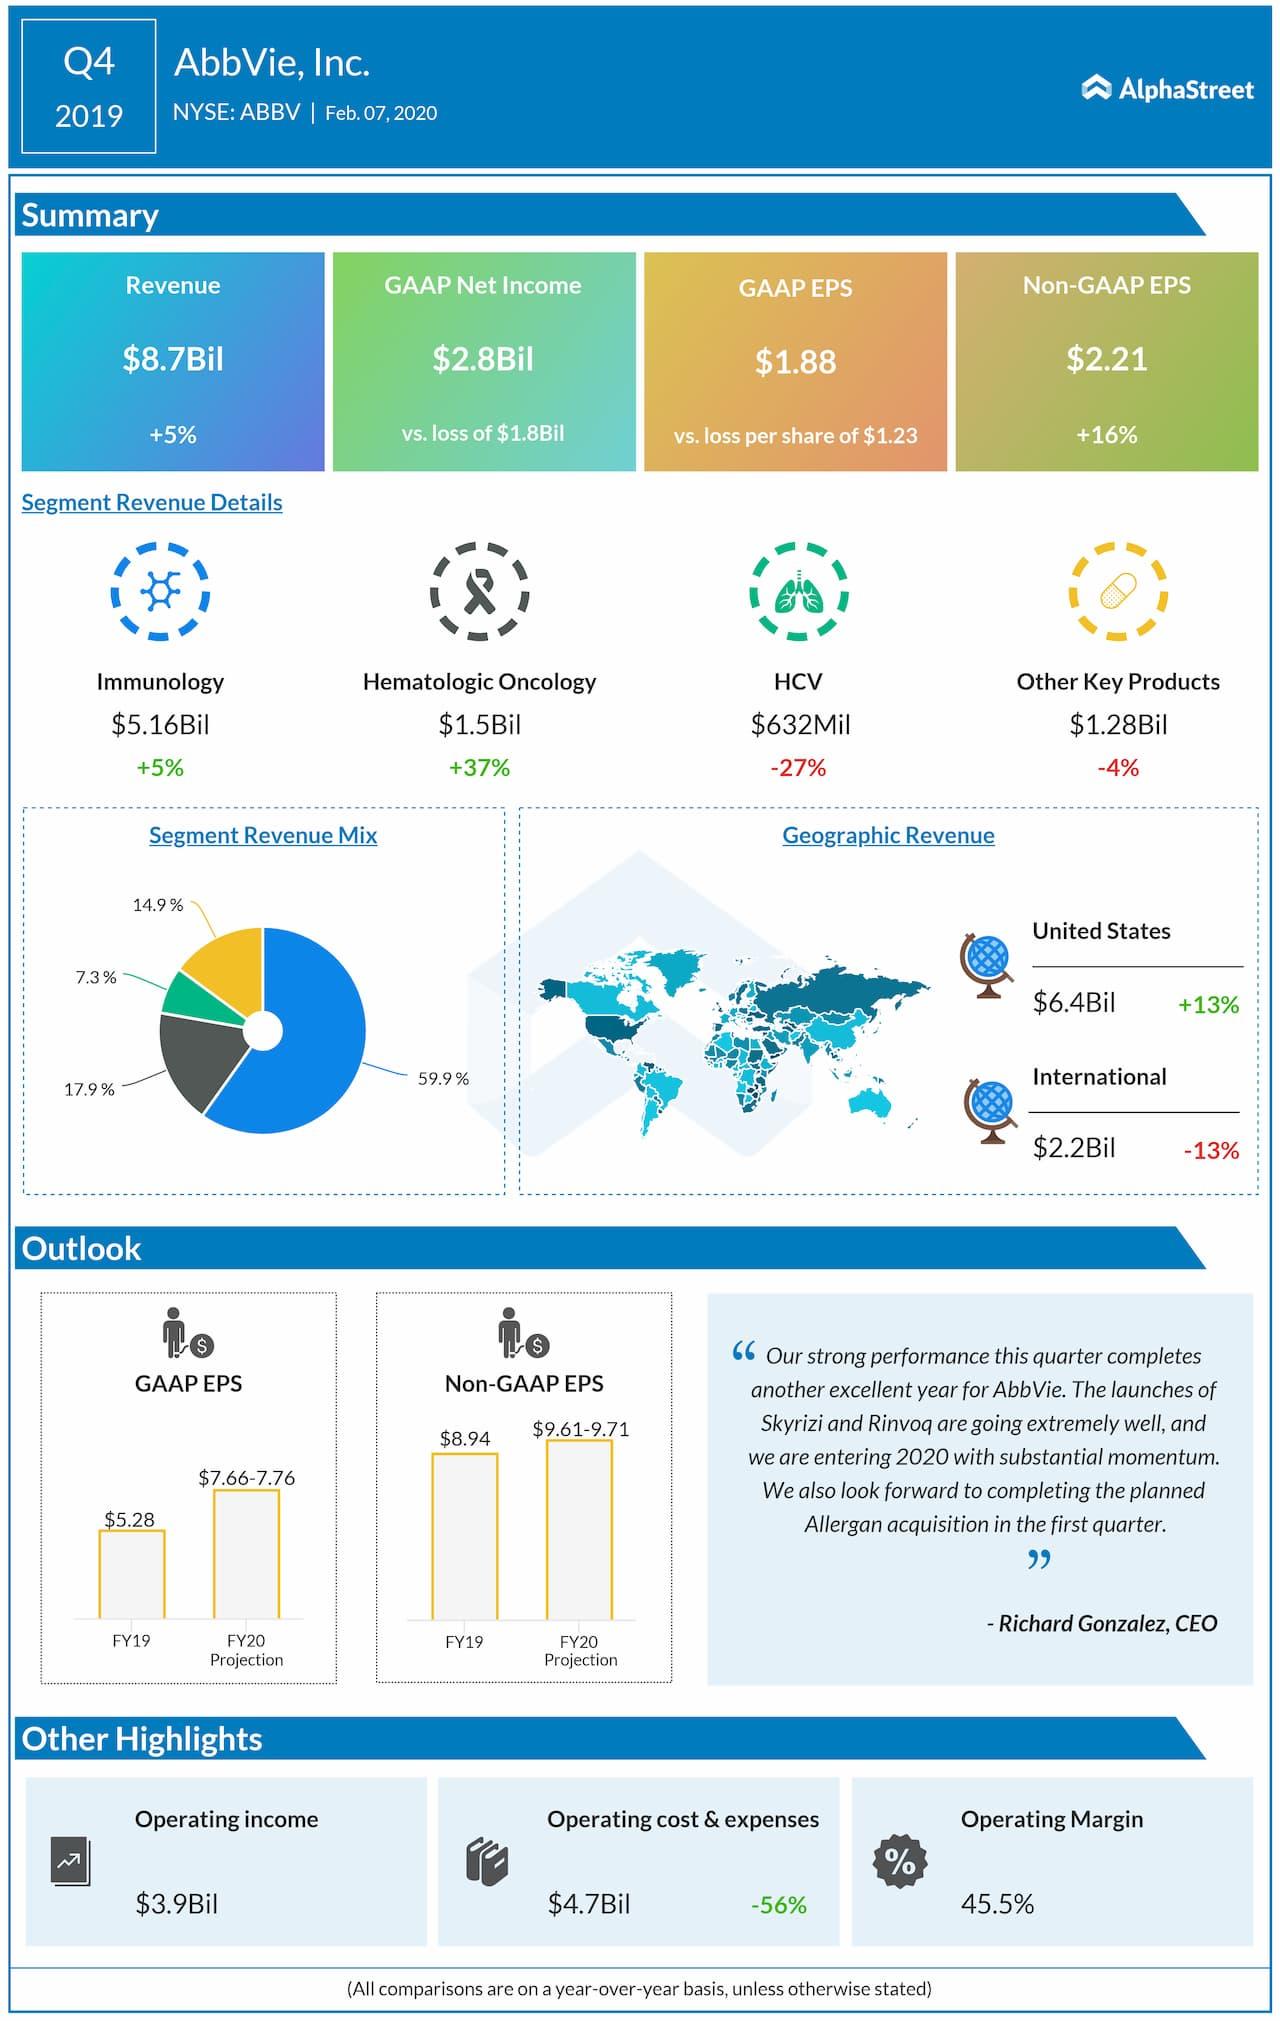 AbbVie tops Q4 2019 revenue and earnings estimates